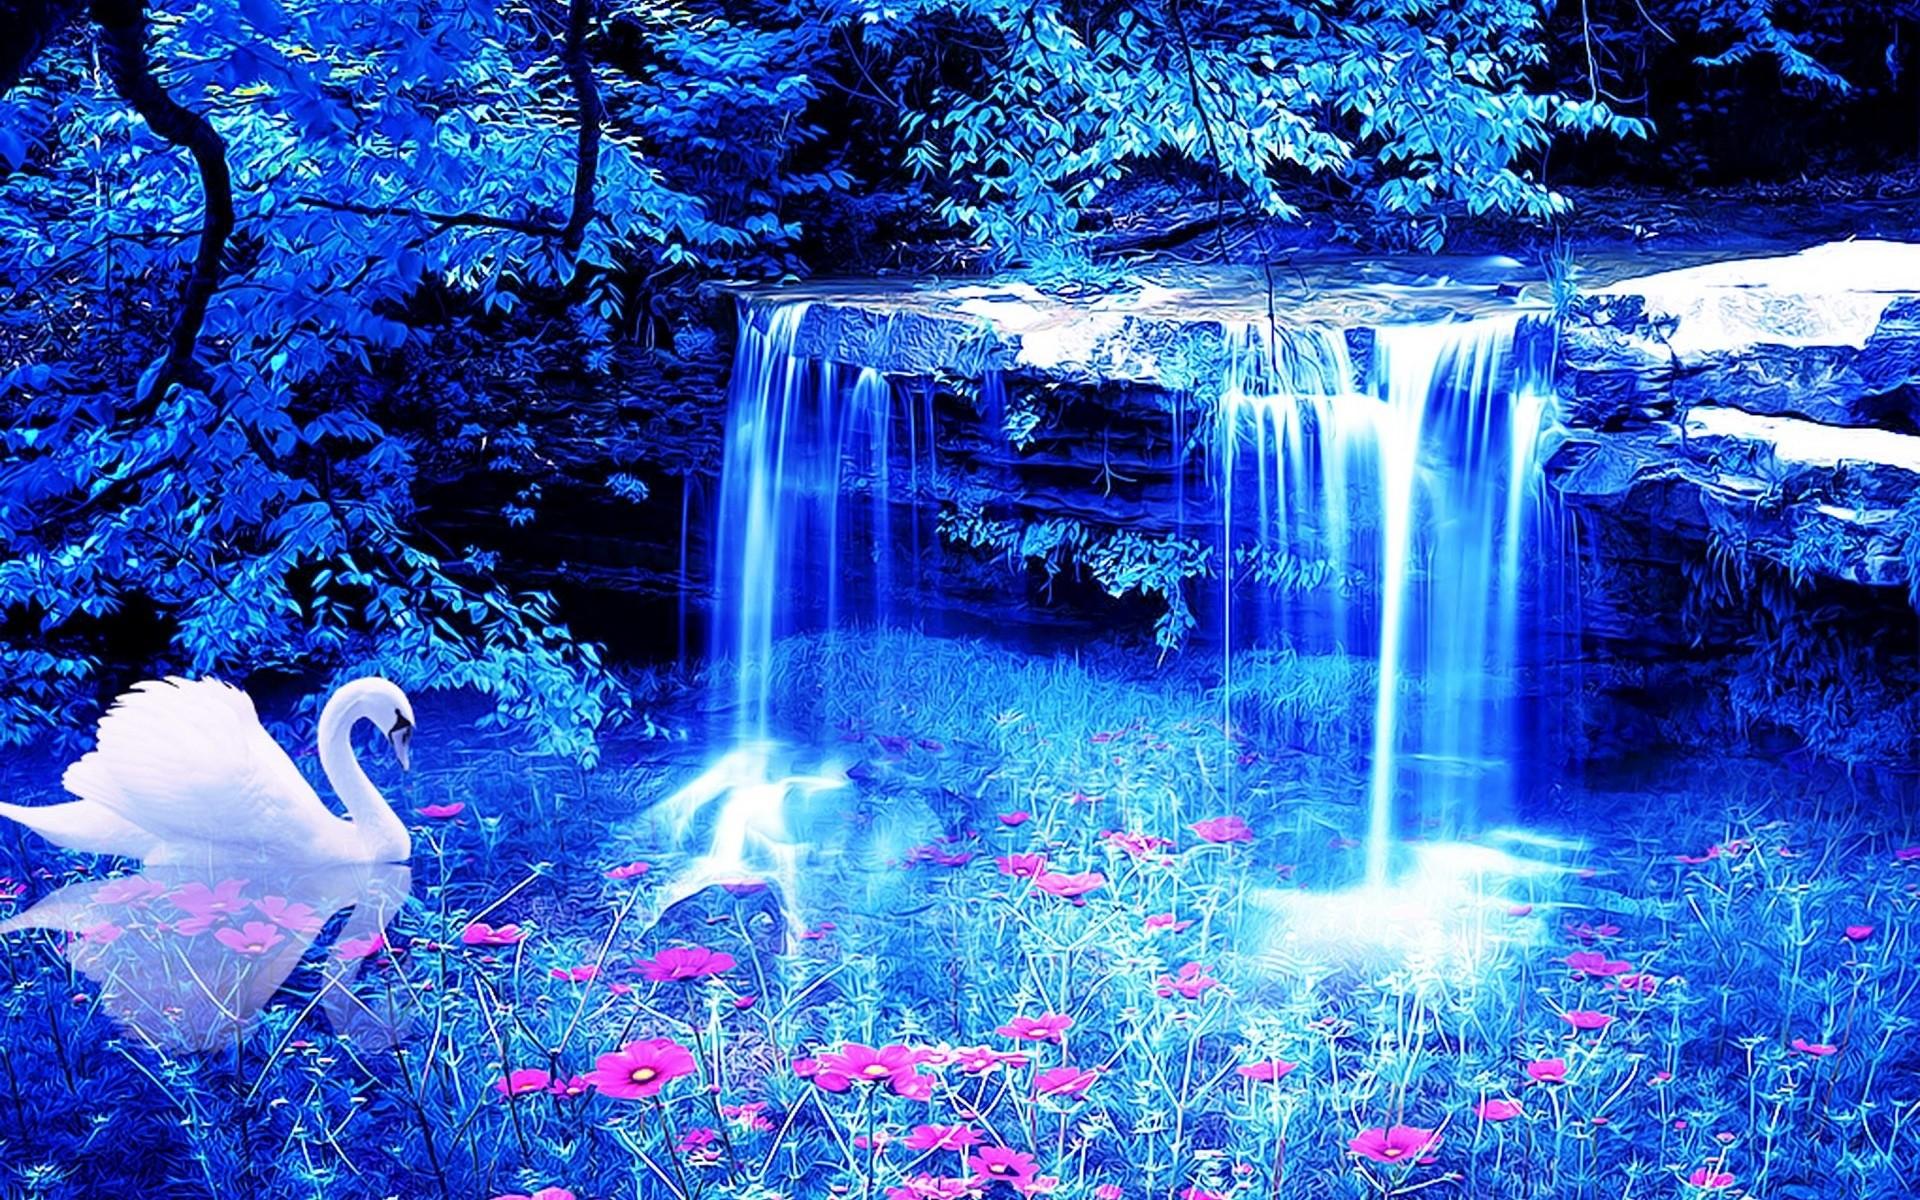 1920x1080 Most Beautiful Waterfalls Wallpapers Hd Free